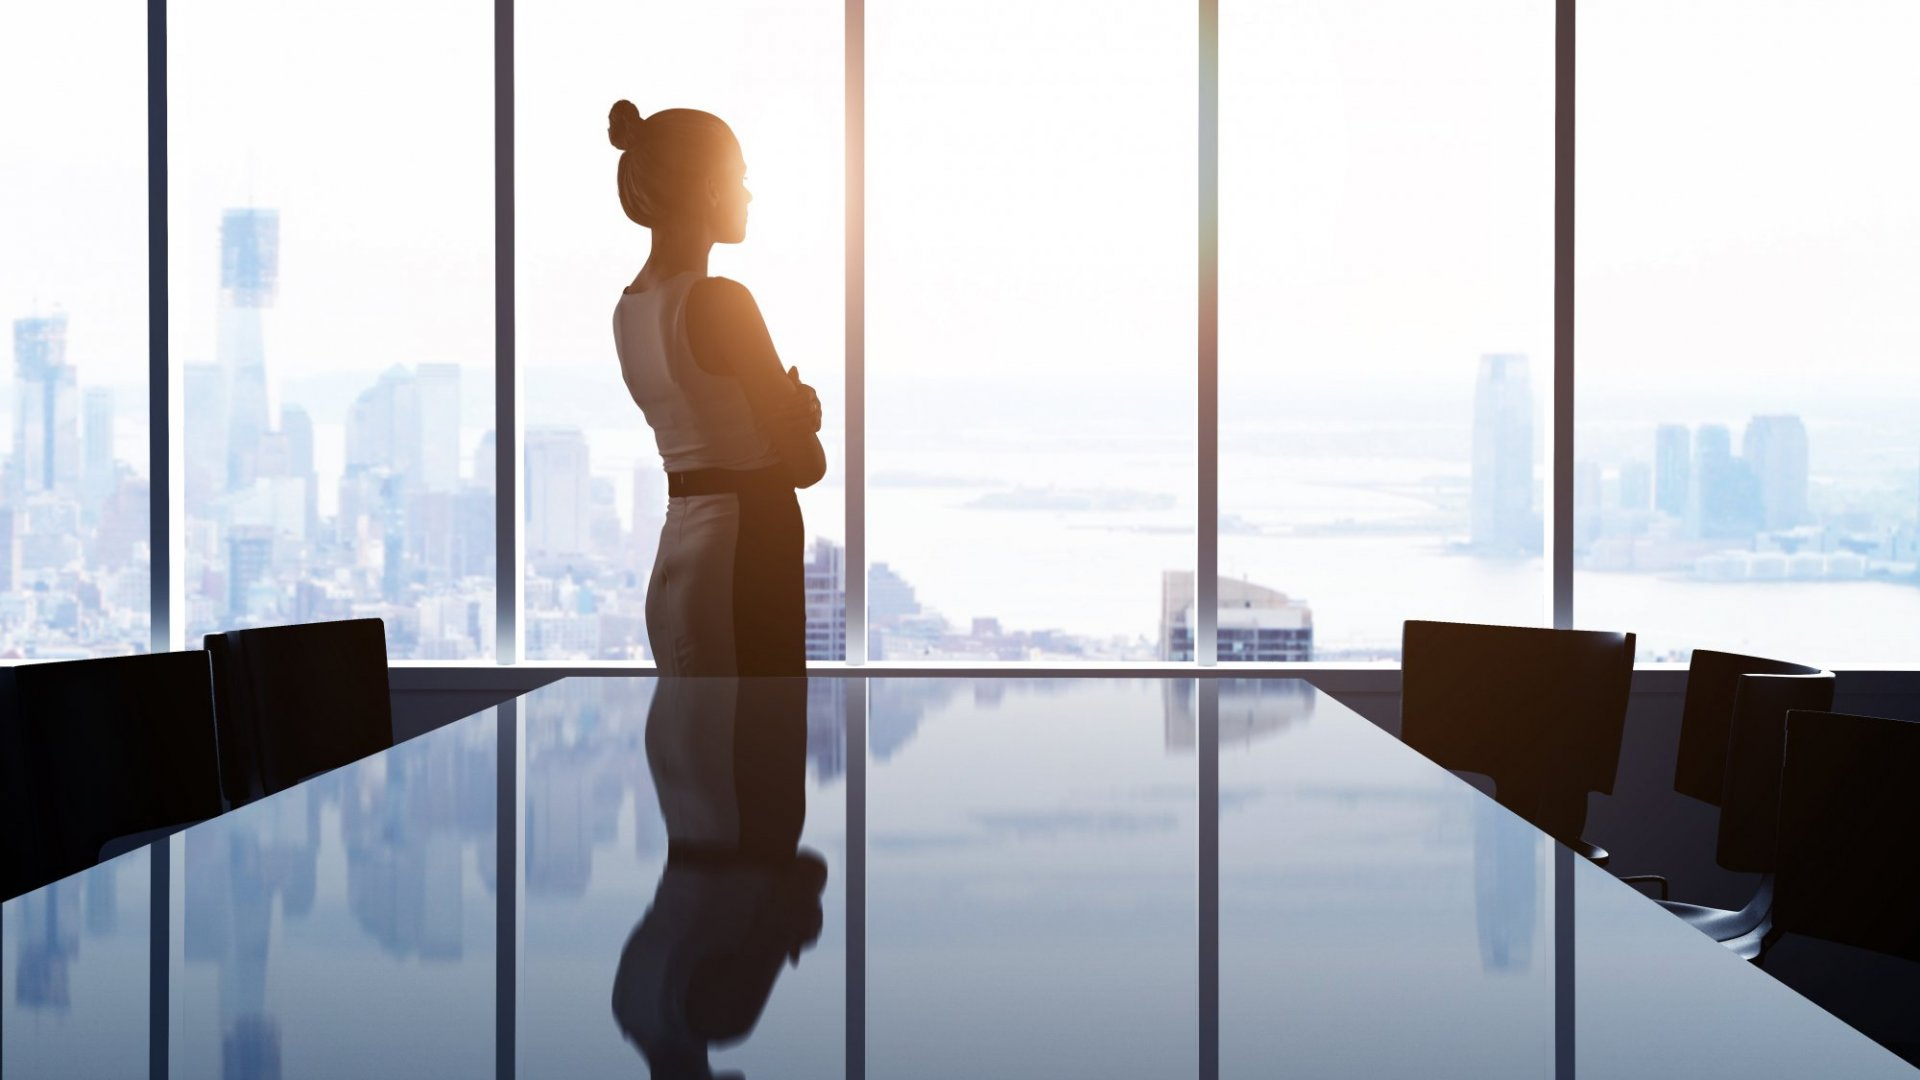 5 Traits that Make Women Better Global Leaders